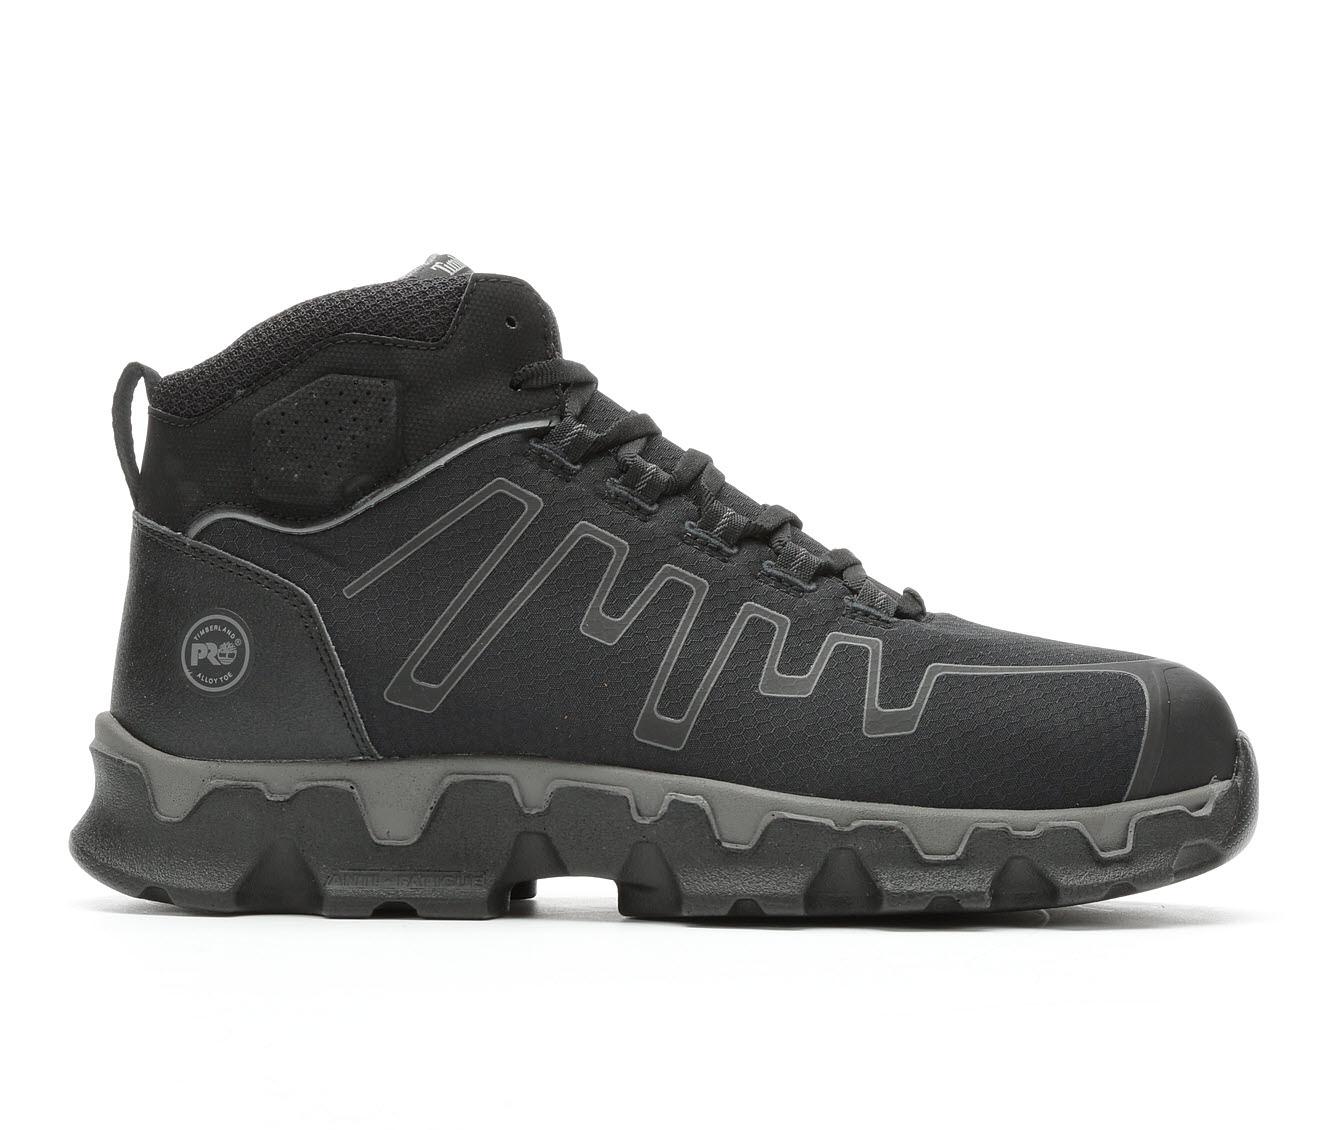 Timberland Pro Powertrain Sport Mid A1JYQ Men's Boots (Black Canvas)